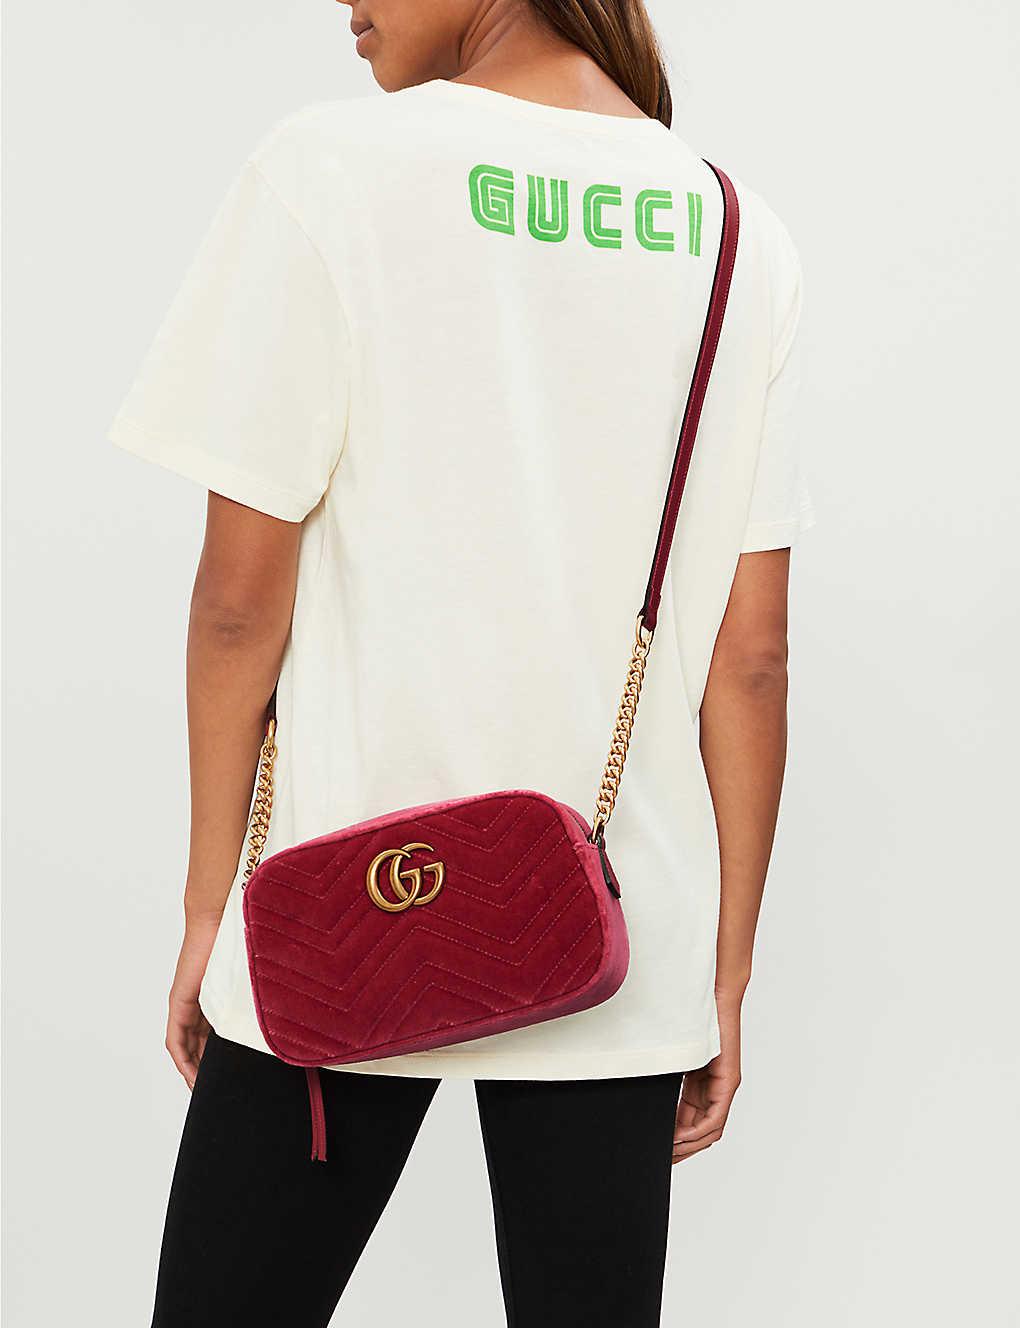 4b1b18008c8 GUCCI - GG Marmont small velvet shoulder bag